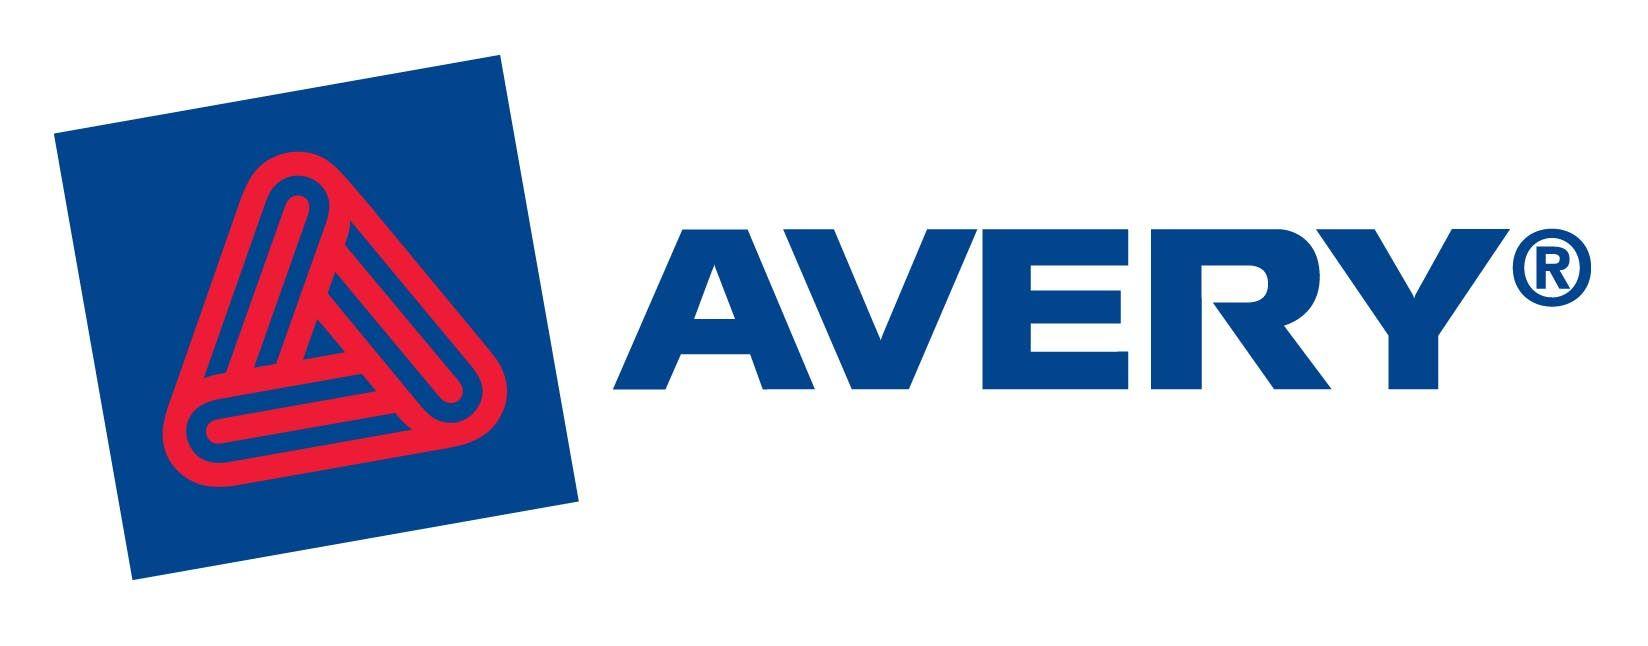 Avery anbieter